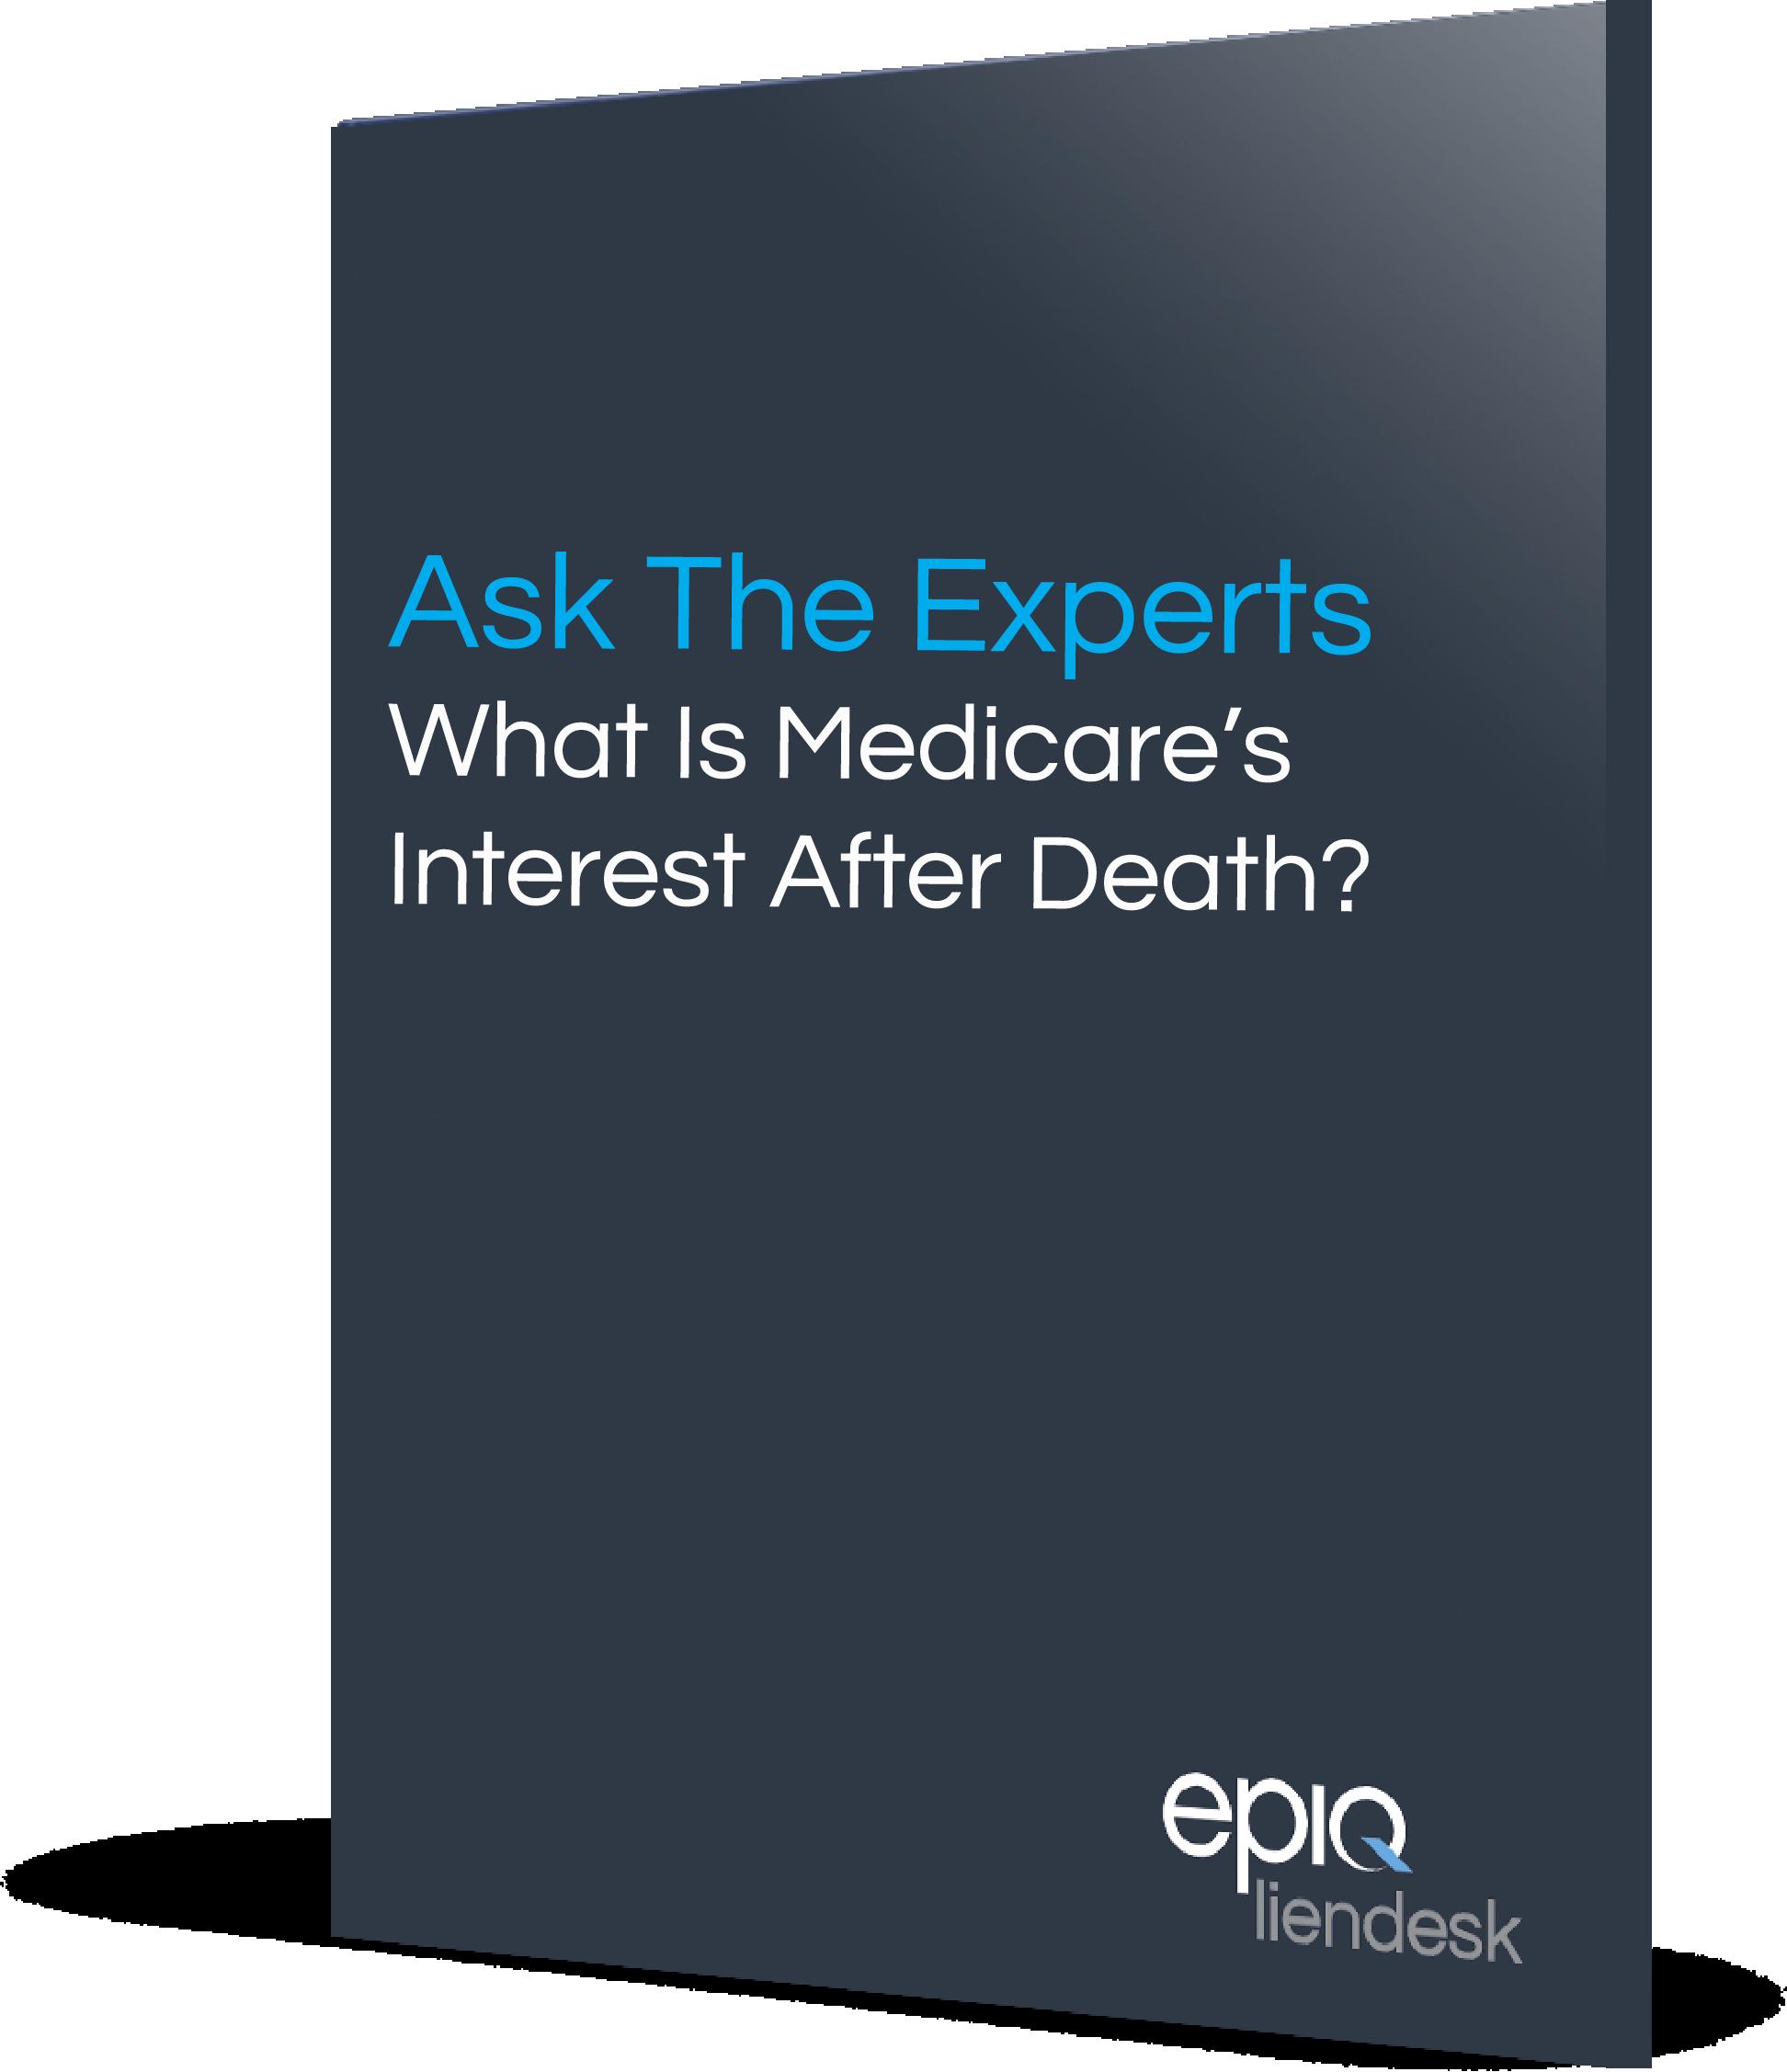 Medicare's Interest